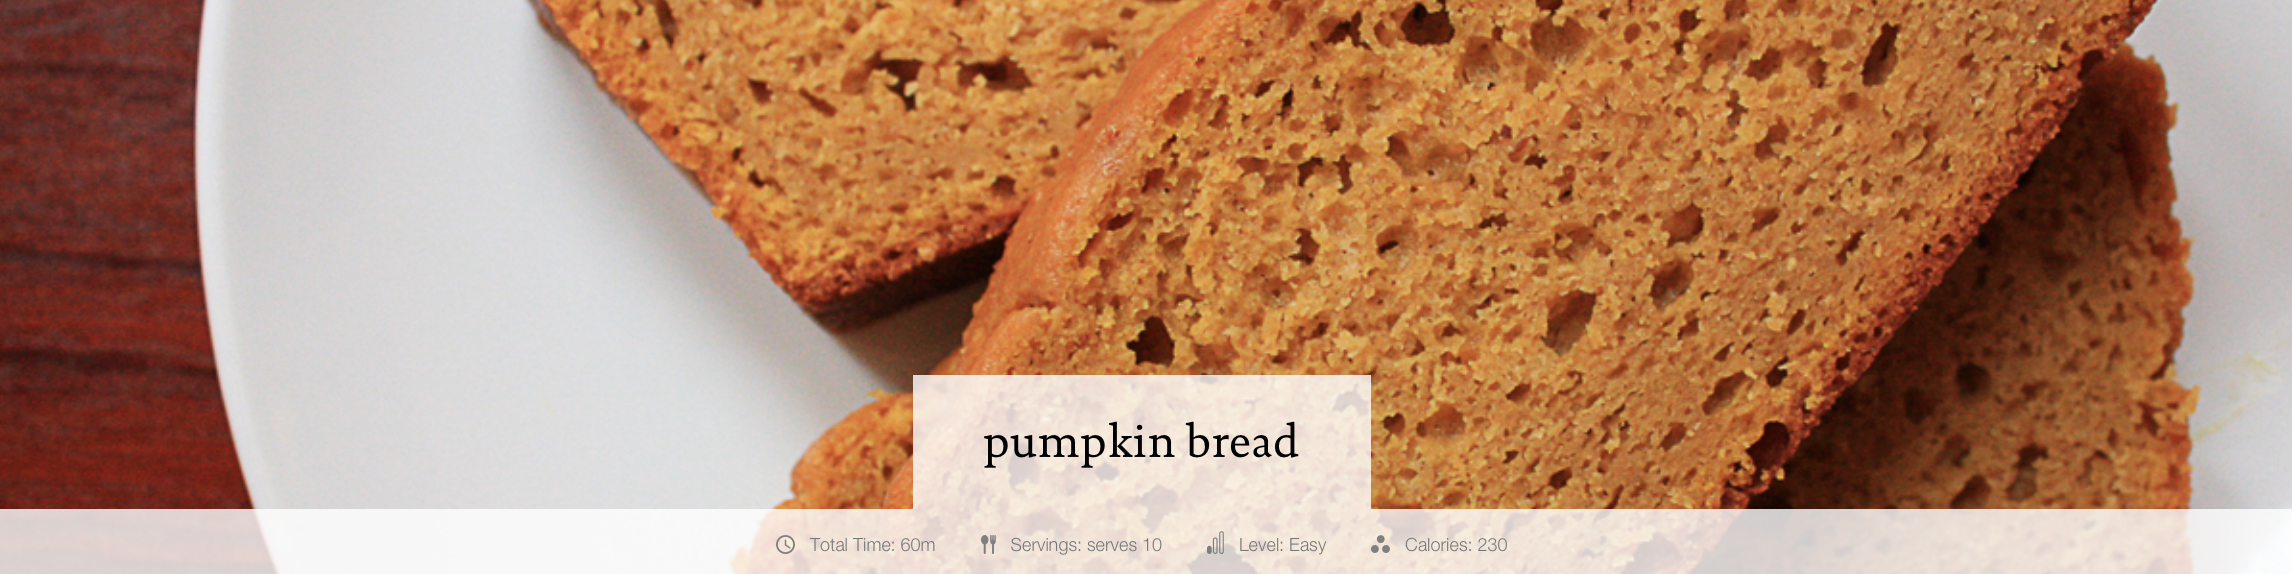 Siggi's Pumpkin Bread